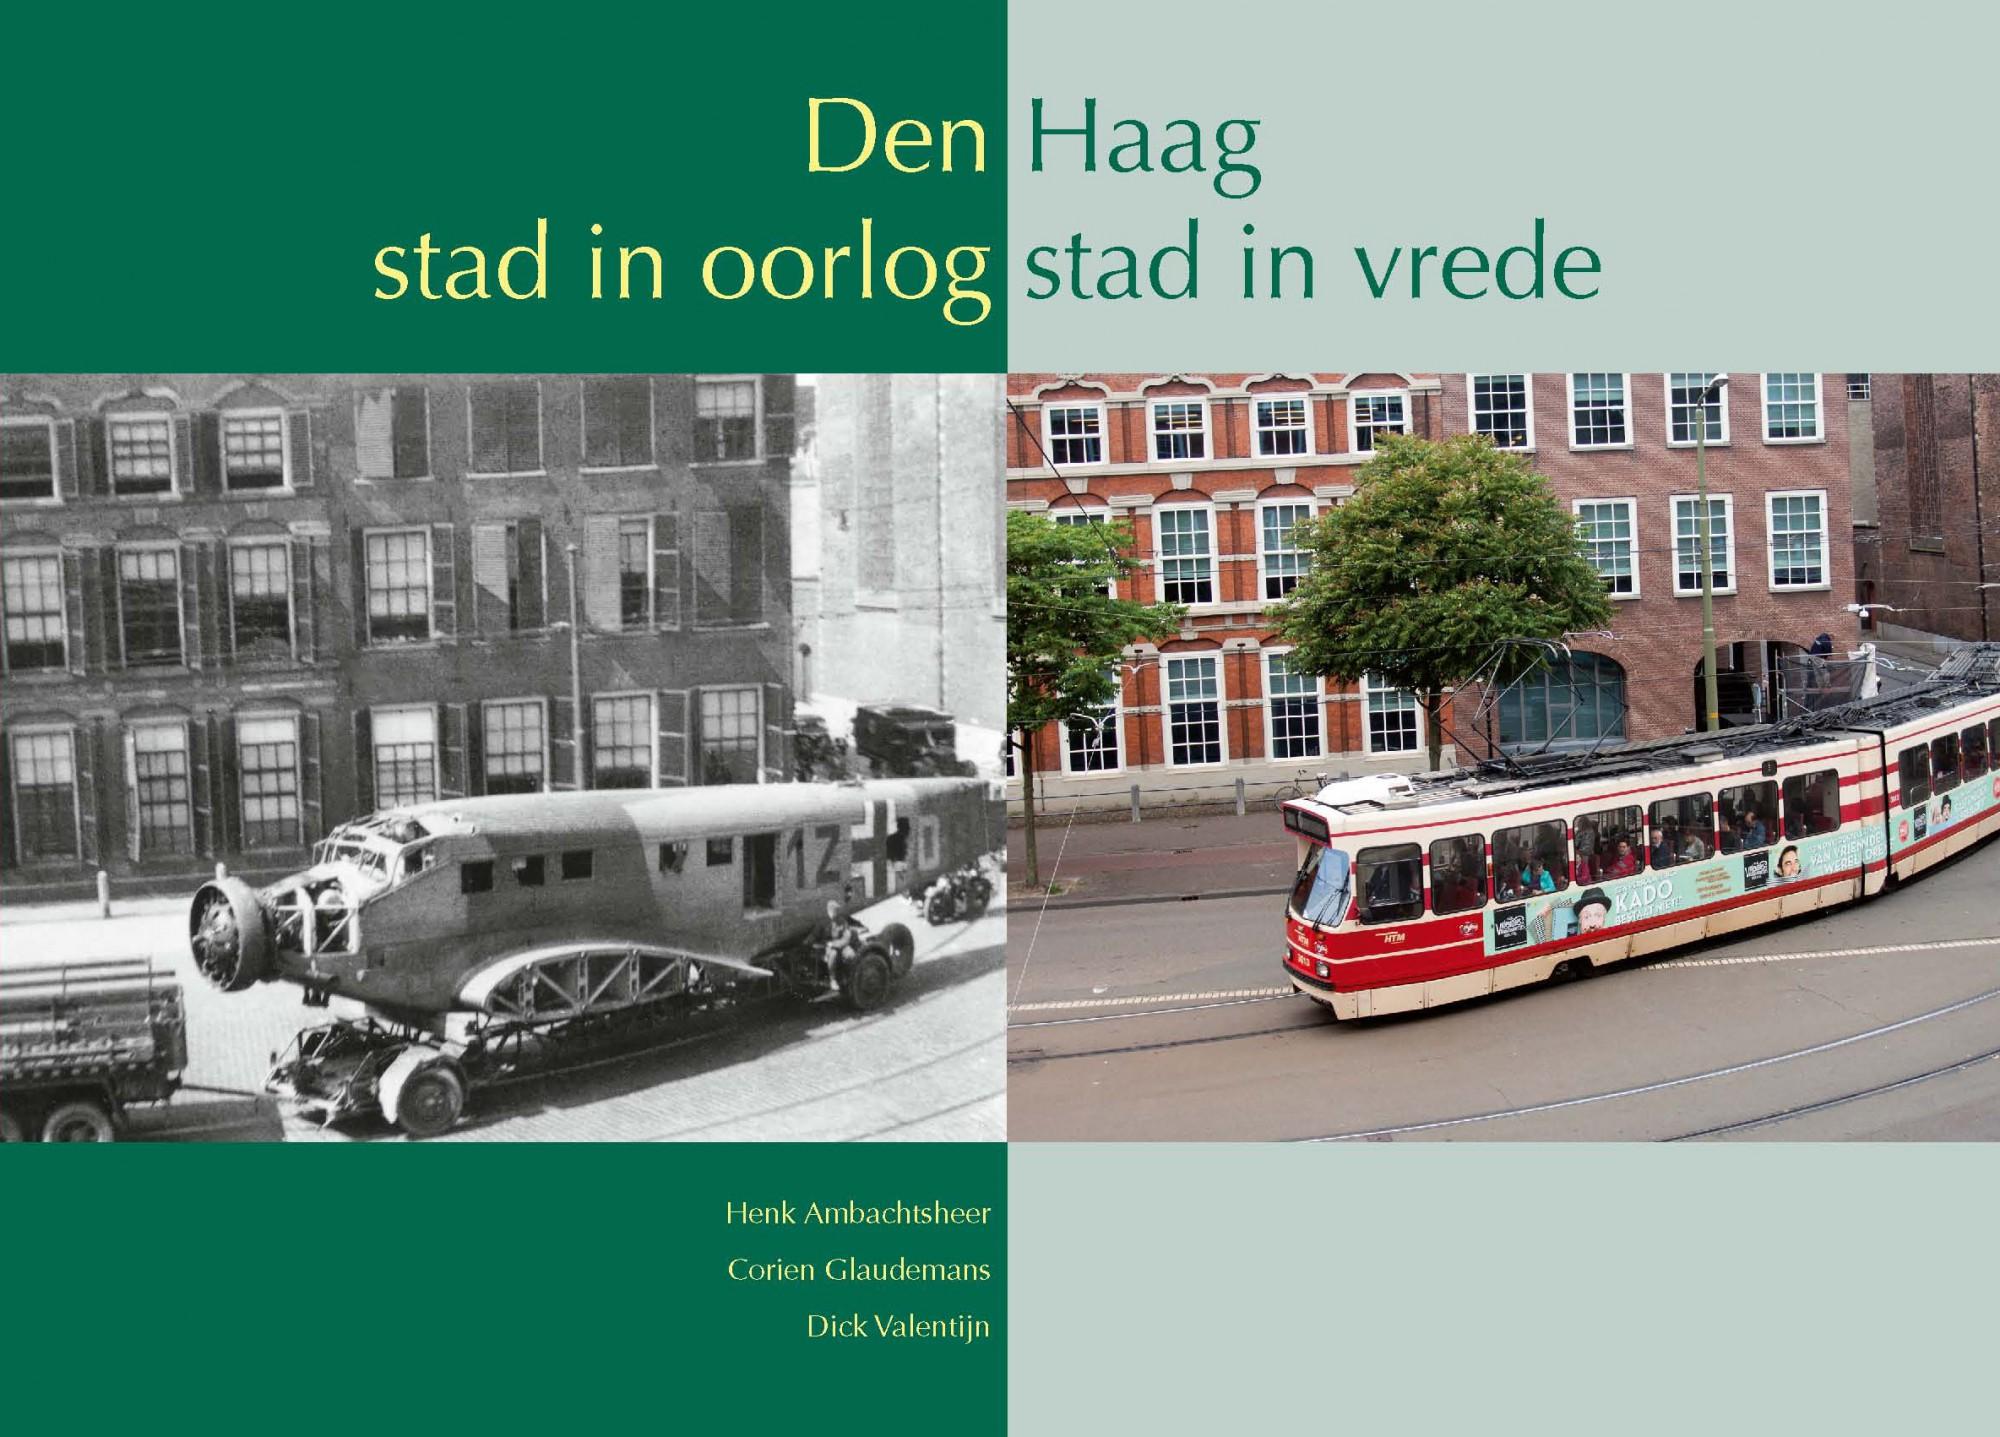 Den Haag stad in oorlog – stad in vrede